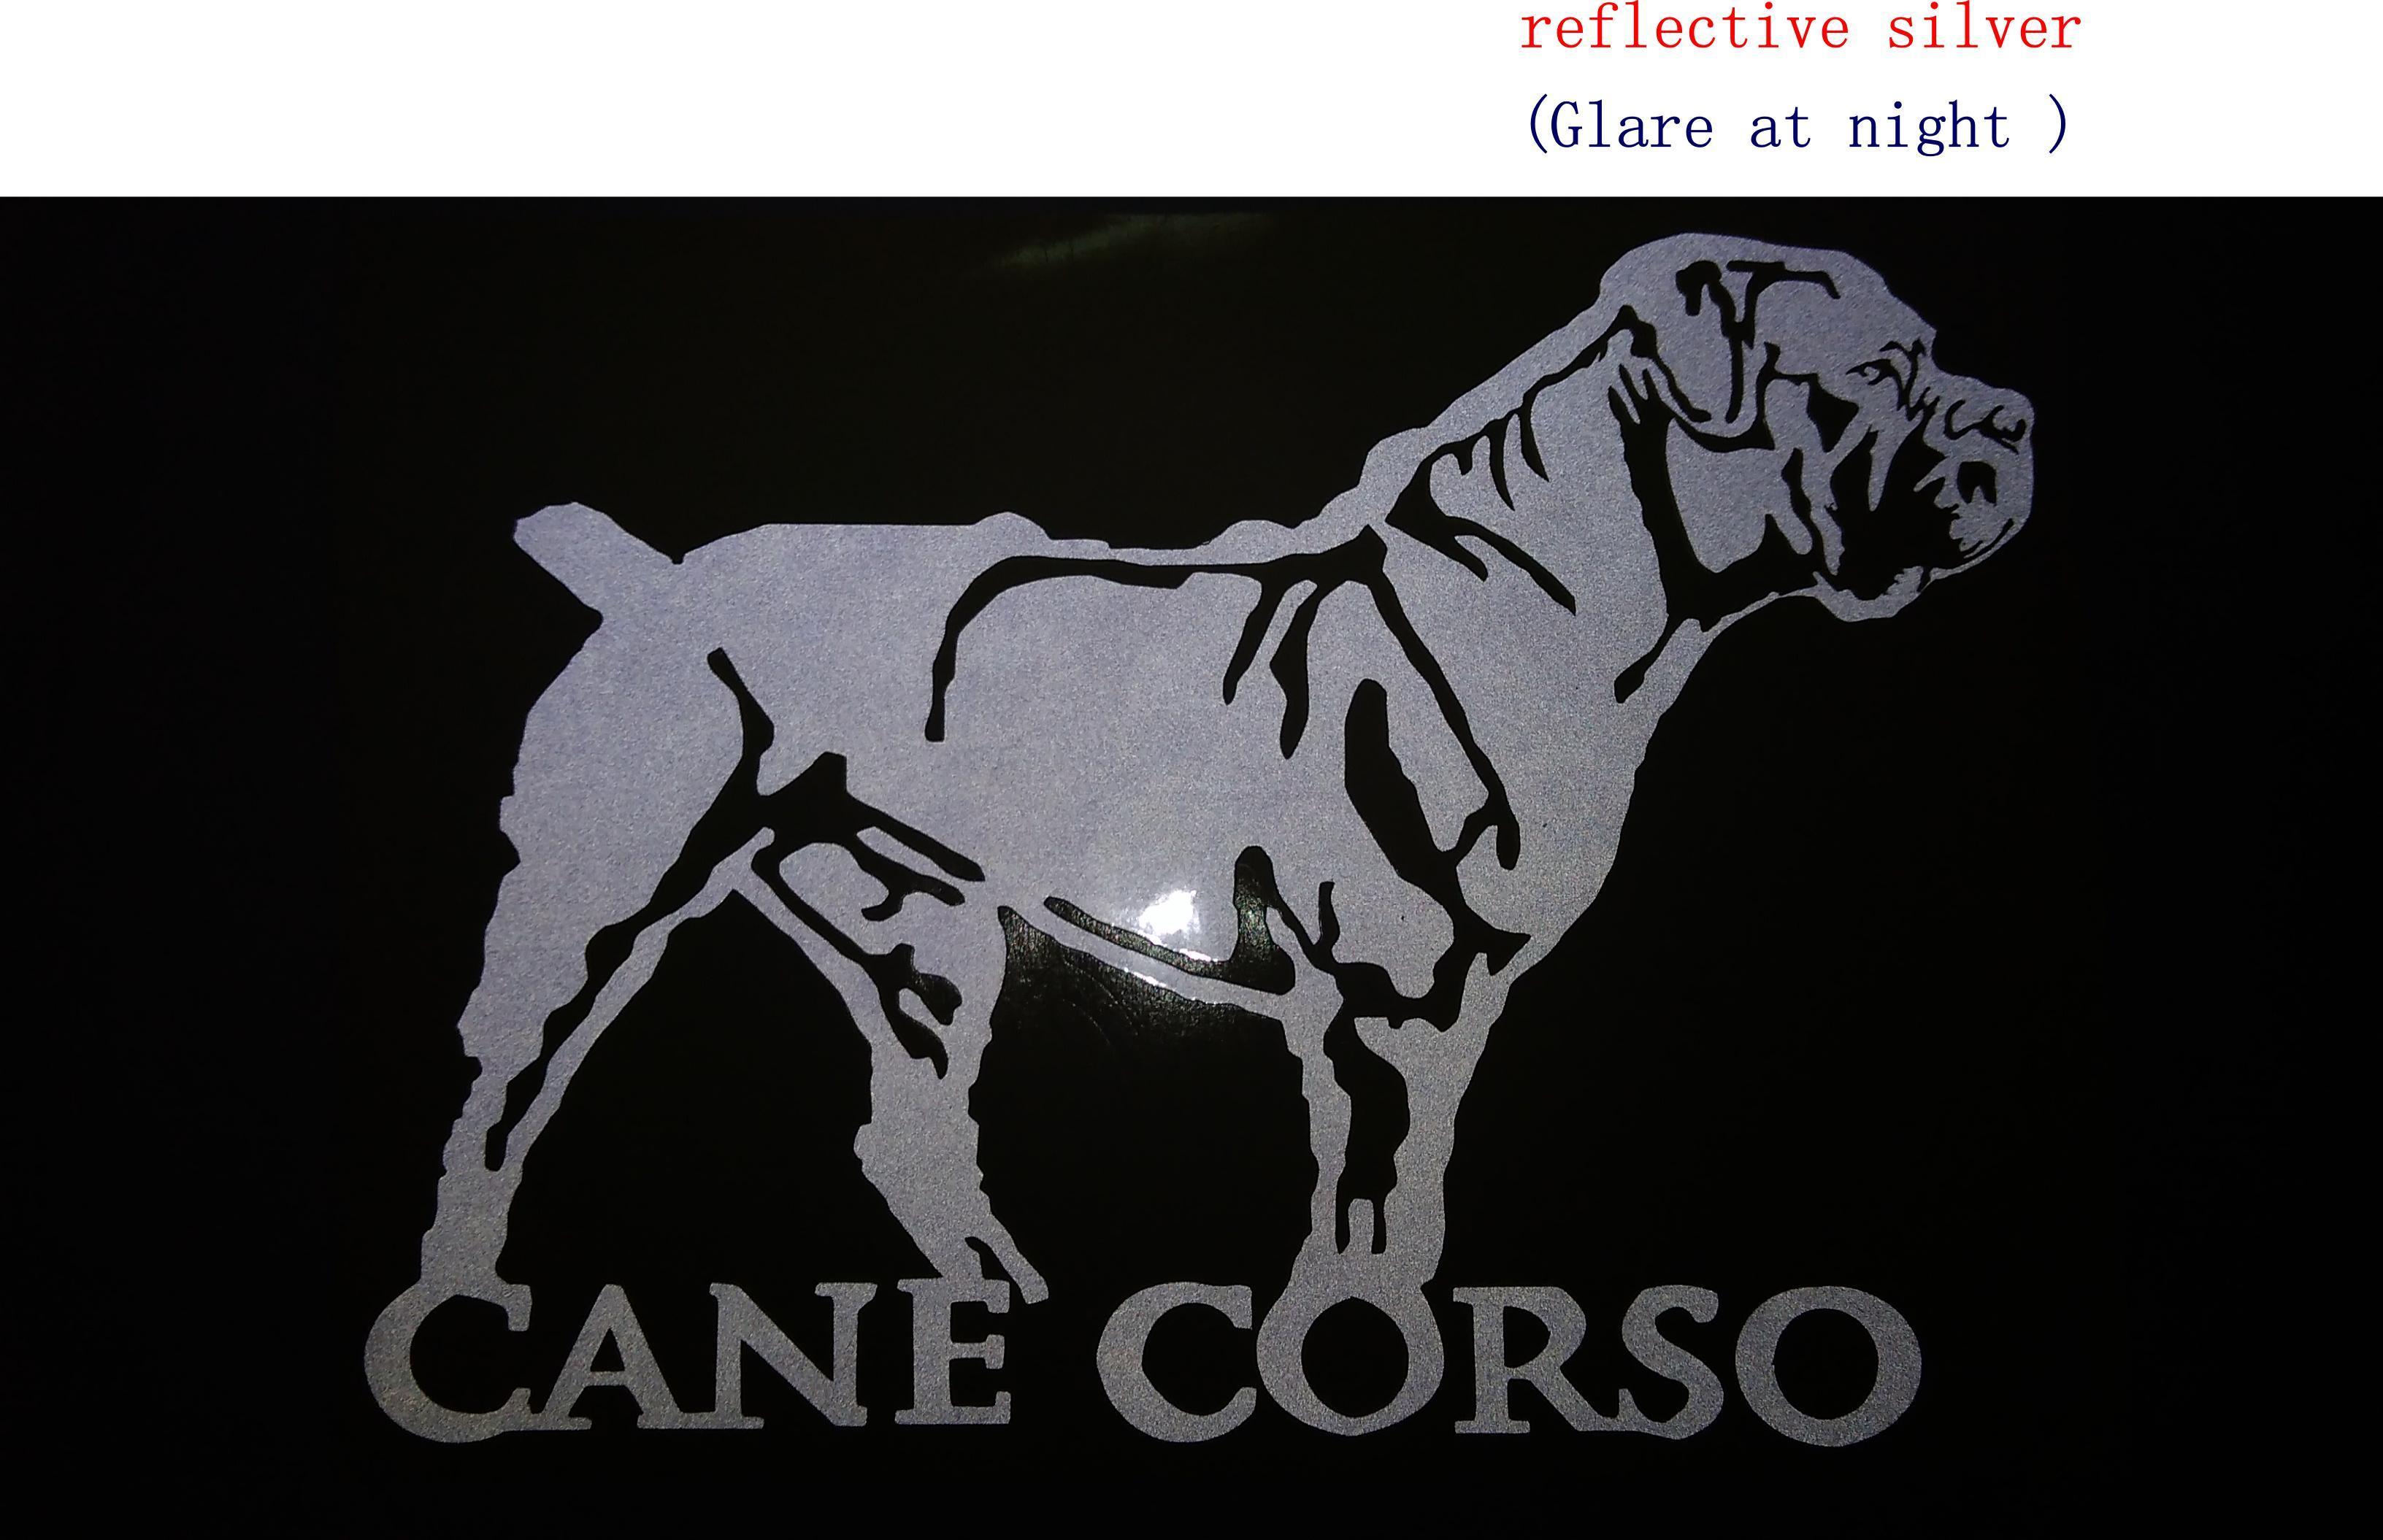 Cane corso cane da corso cane corso italian dog cat vinyl decal lg truck dog car decal vinyl sticker